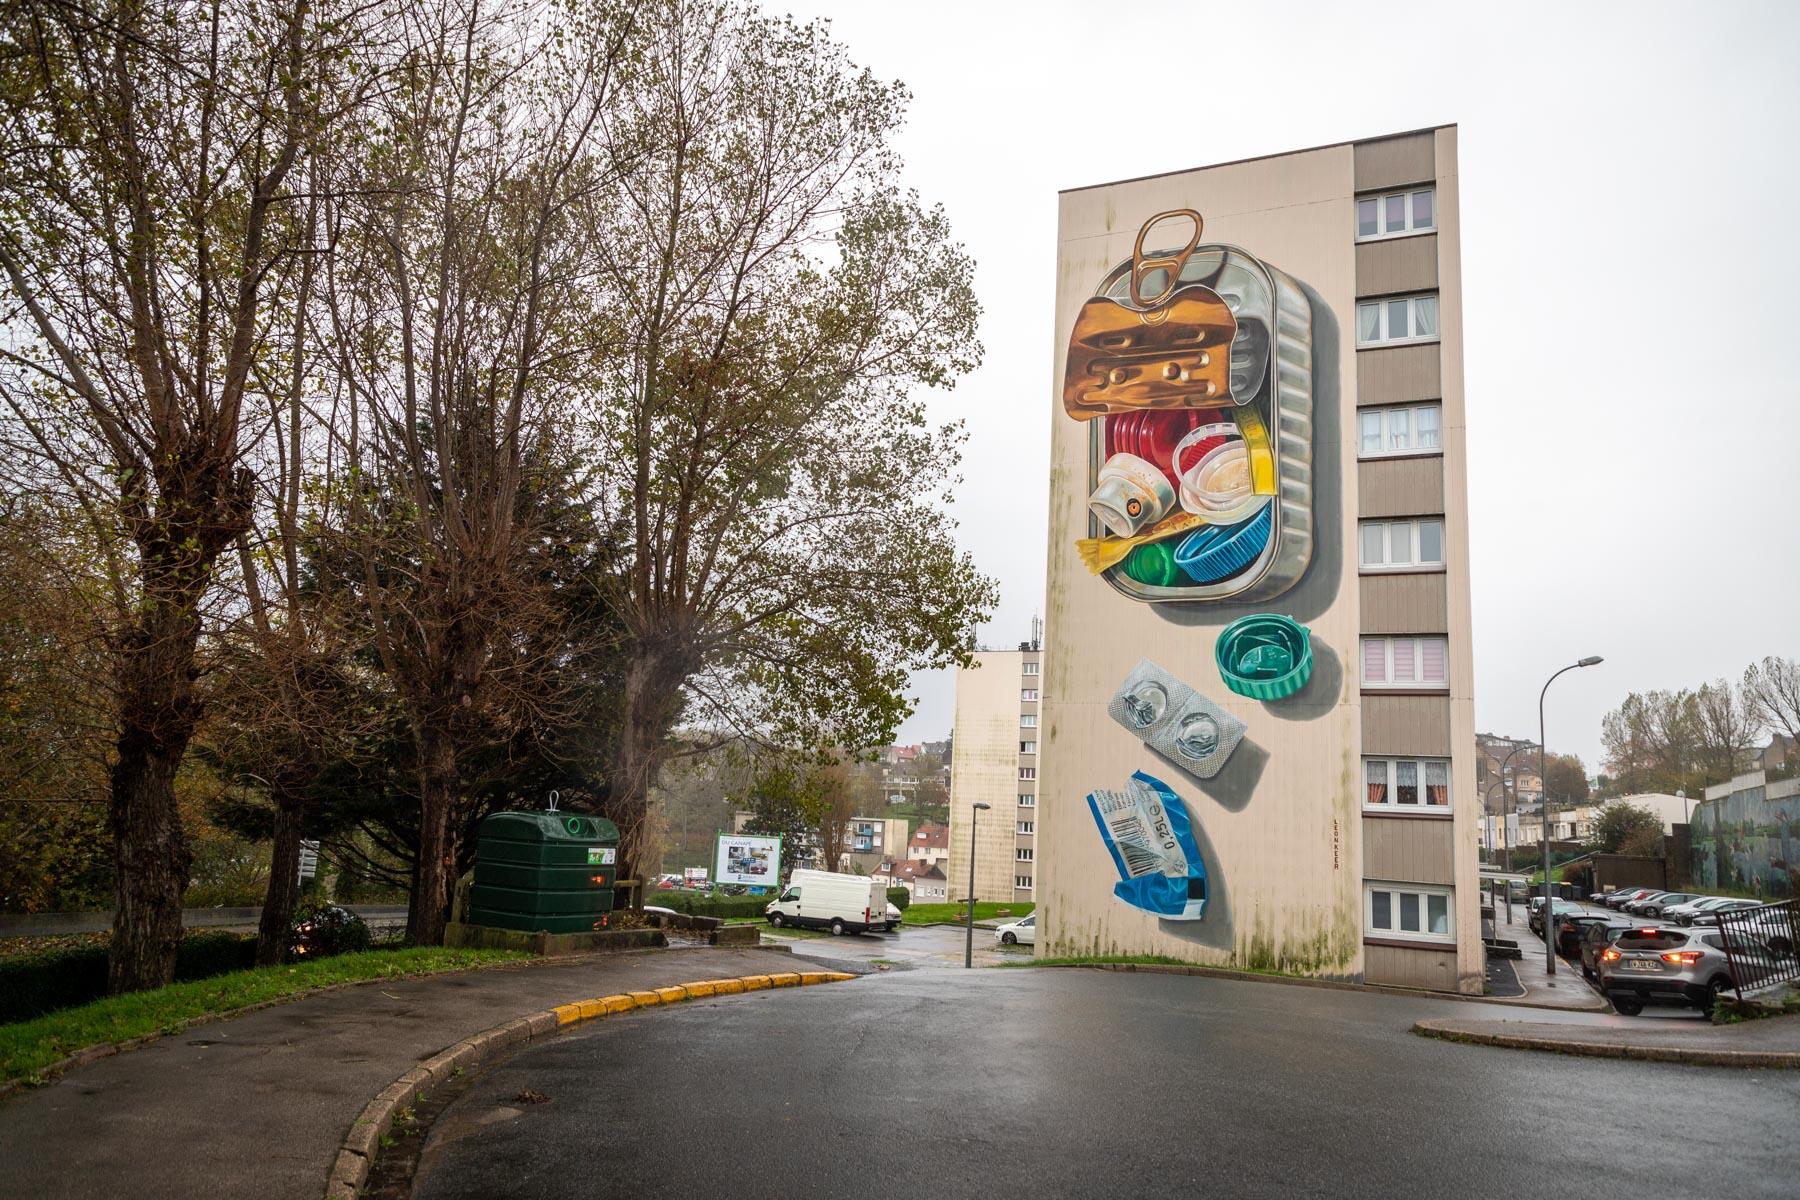 Boulogne sur mer - Octobre 2020